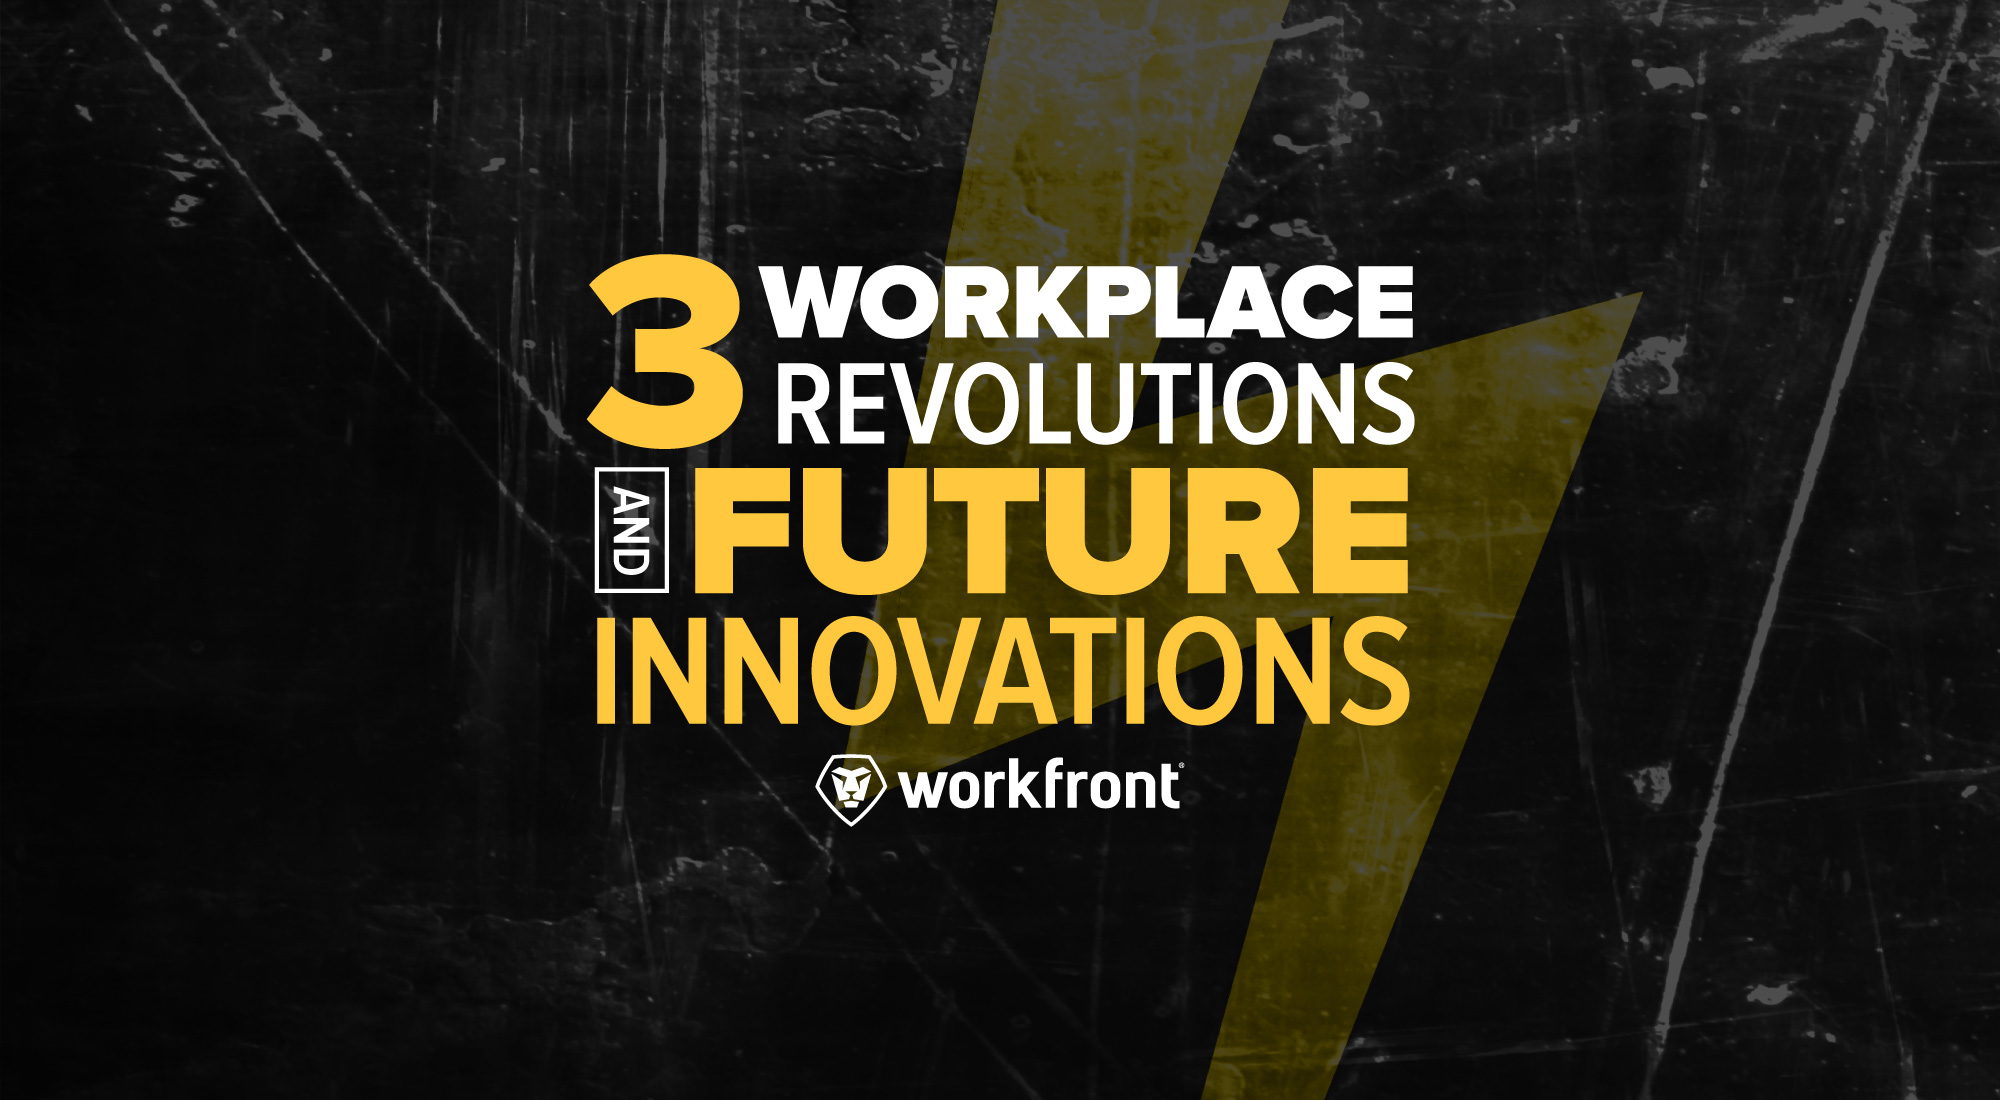 future innovation work